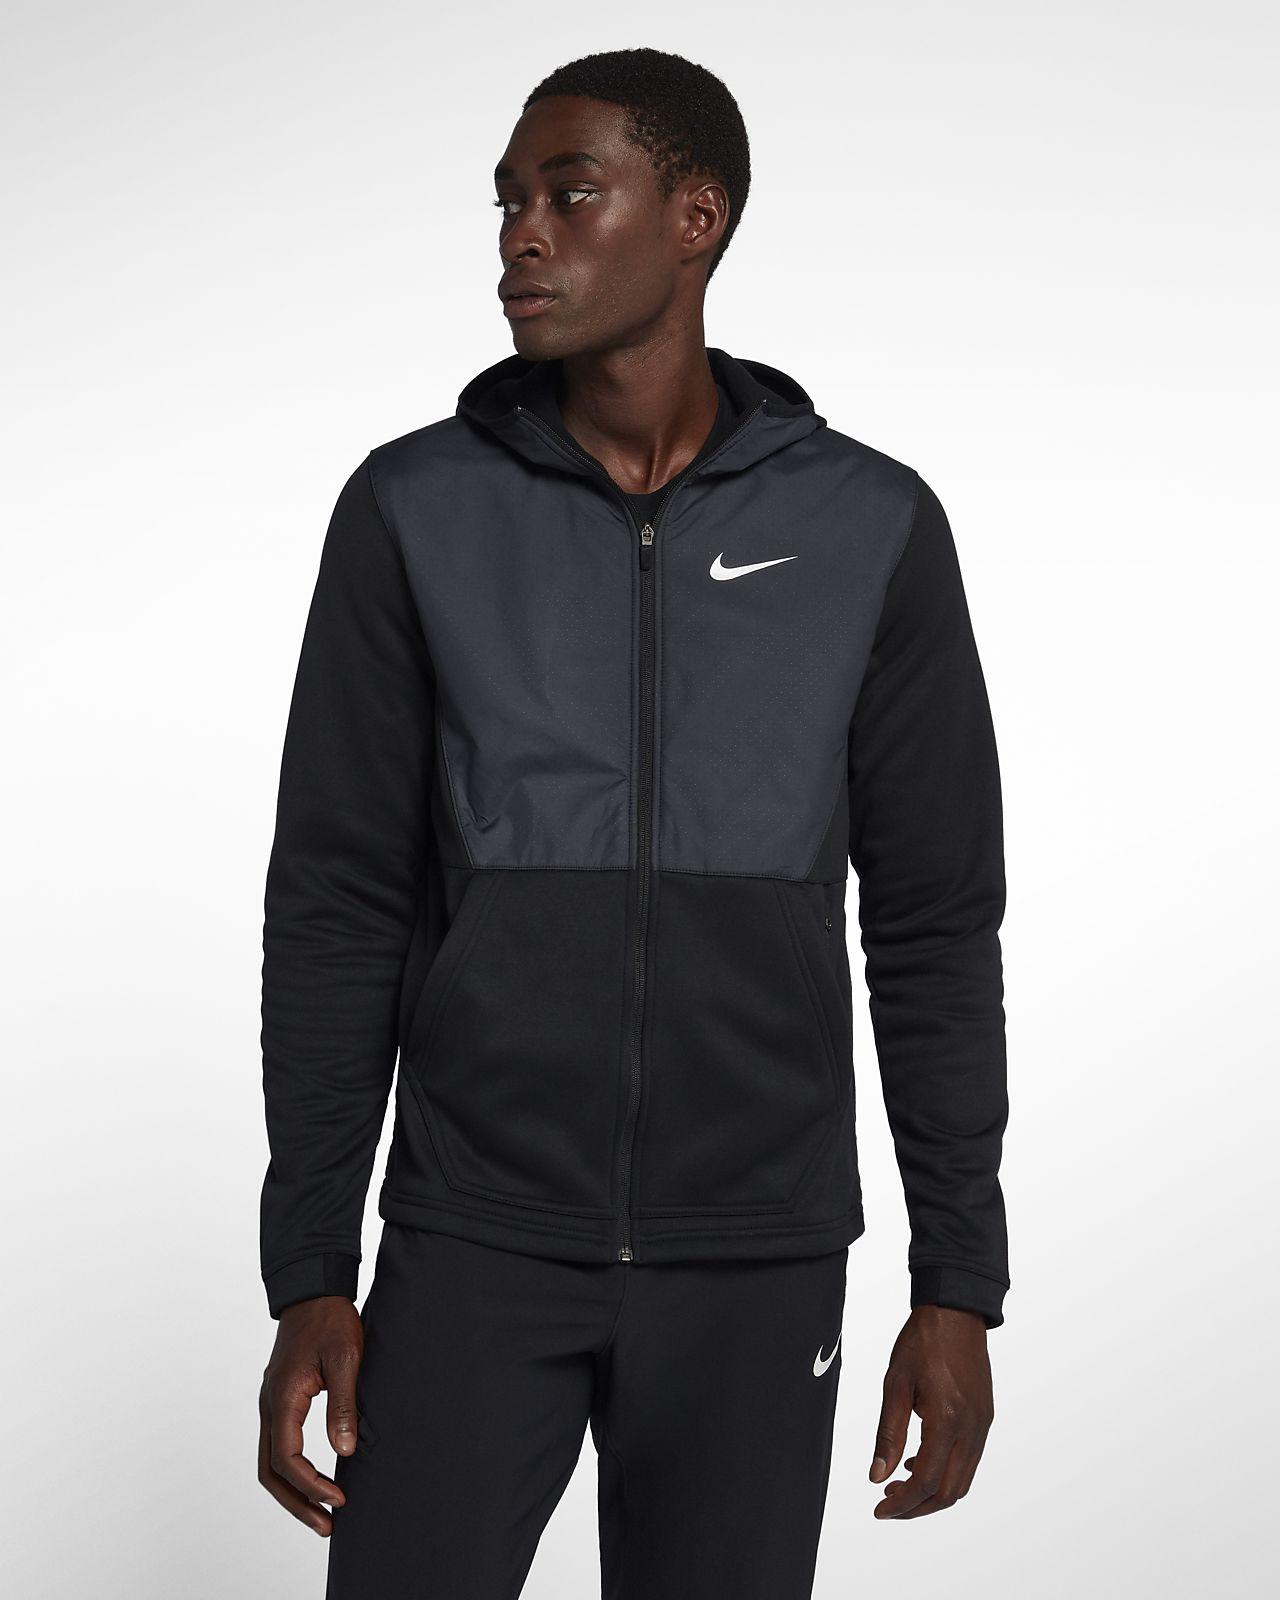 9e2bf4ba7cf Nike Therma Men's Full-Zip Basketball Hoodie. Nike.com